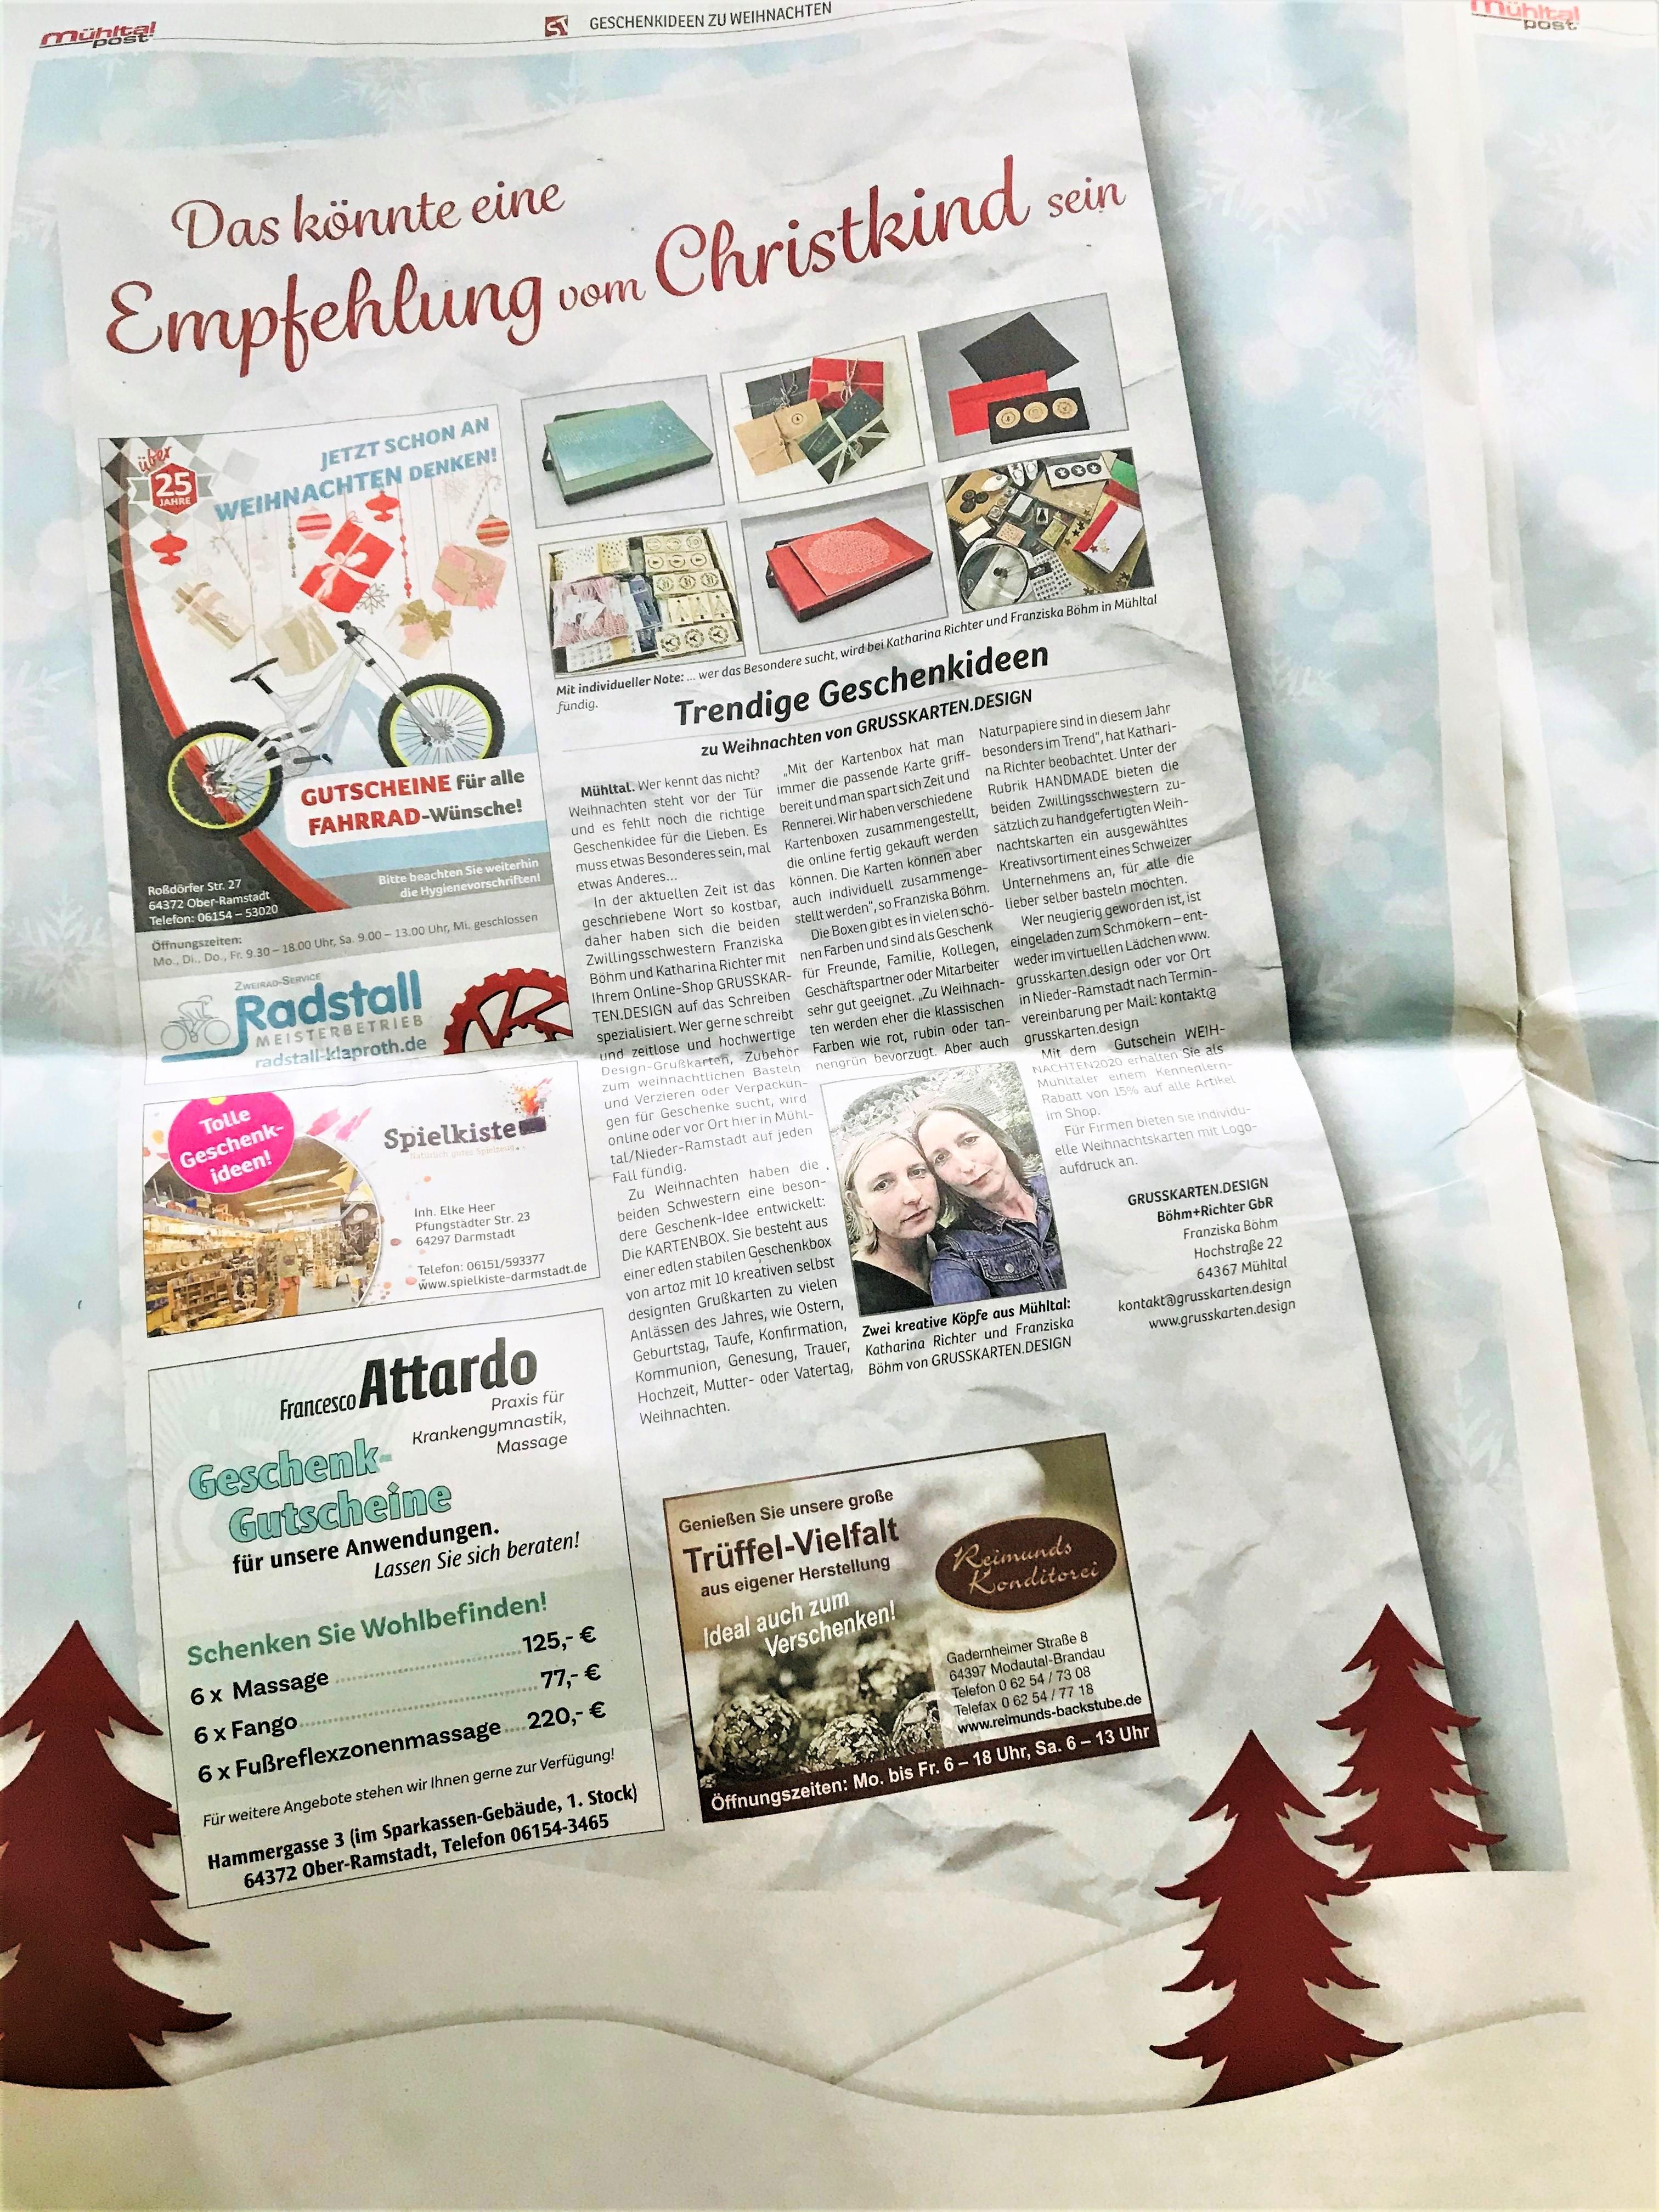 M-hltalpost_28-10-2020_Trendige-Geschenkideen-zu-Weihnachten